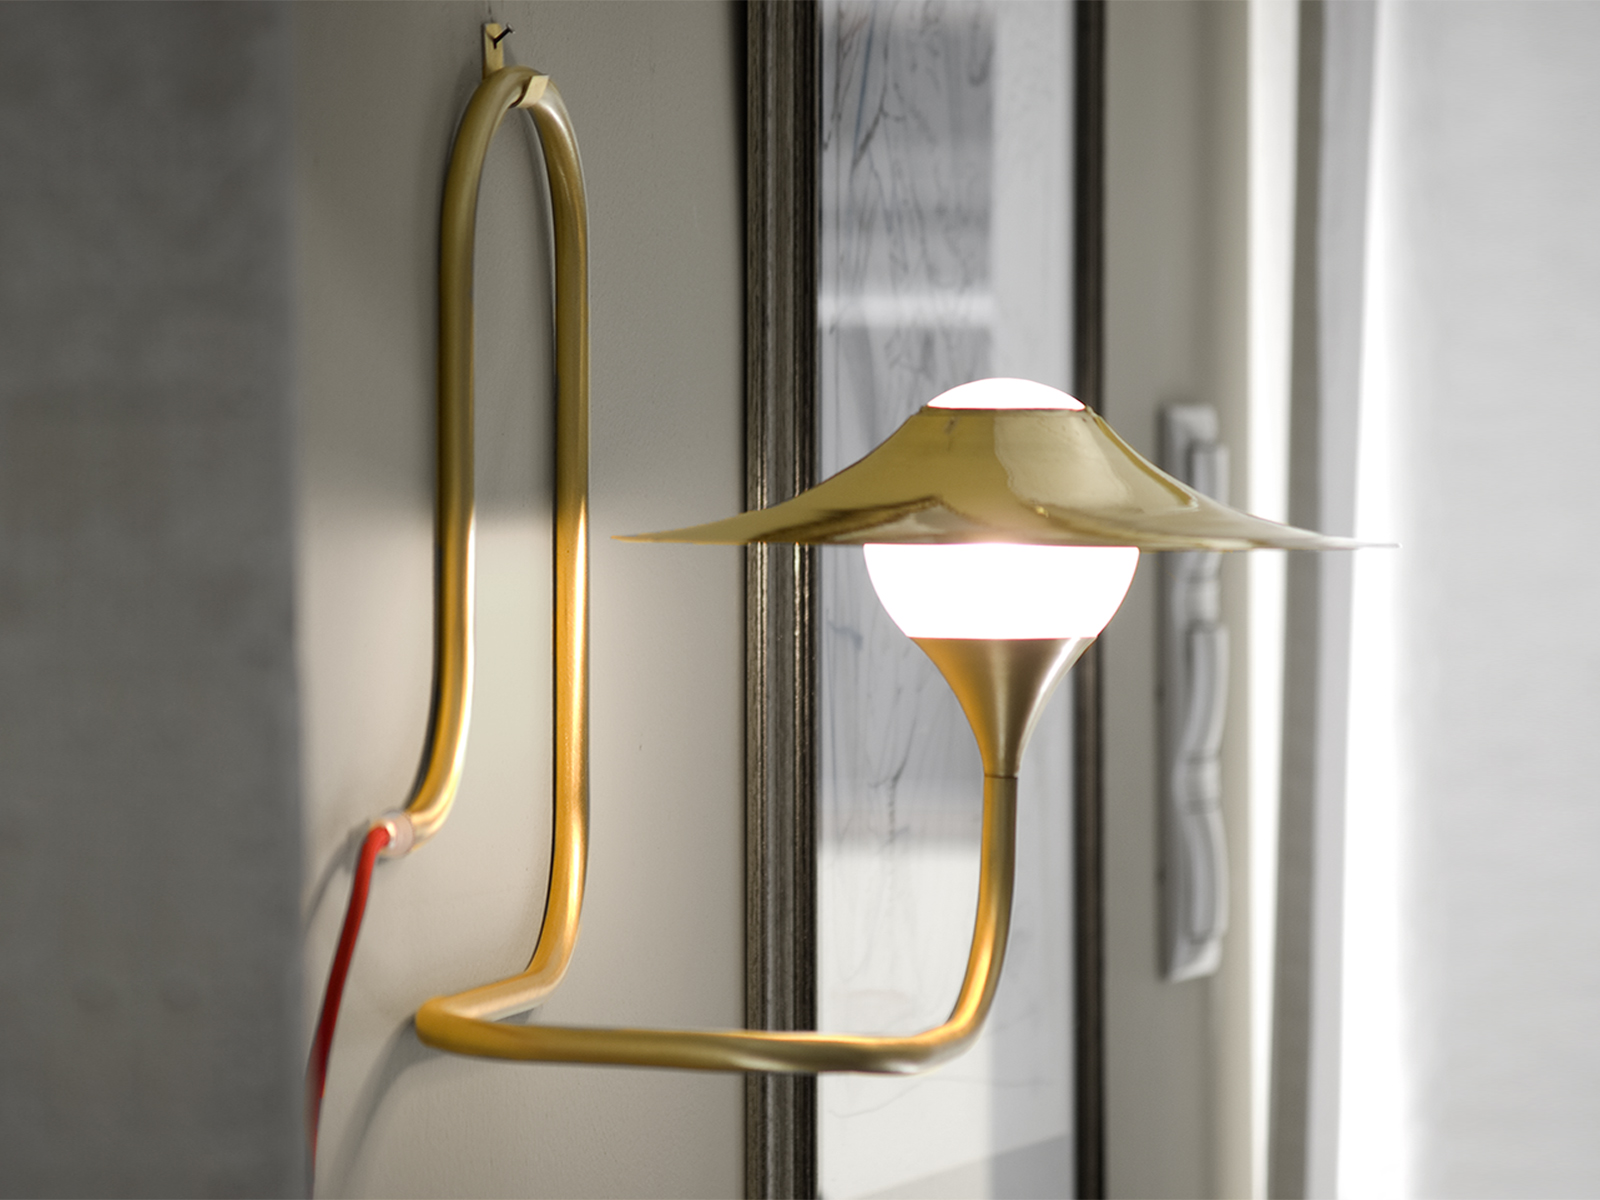 Wall Lamps Copper : TURBAYA Copper wall lamp by Intueri Light